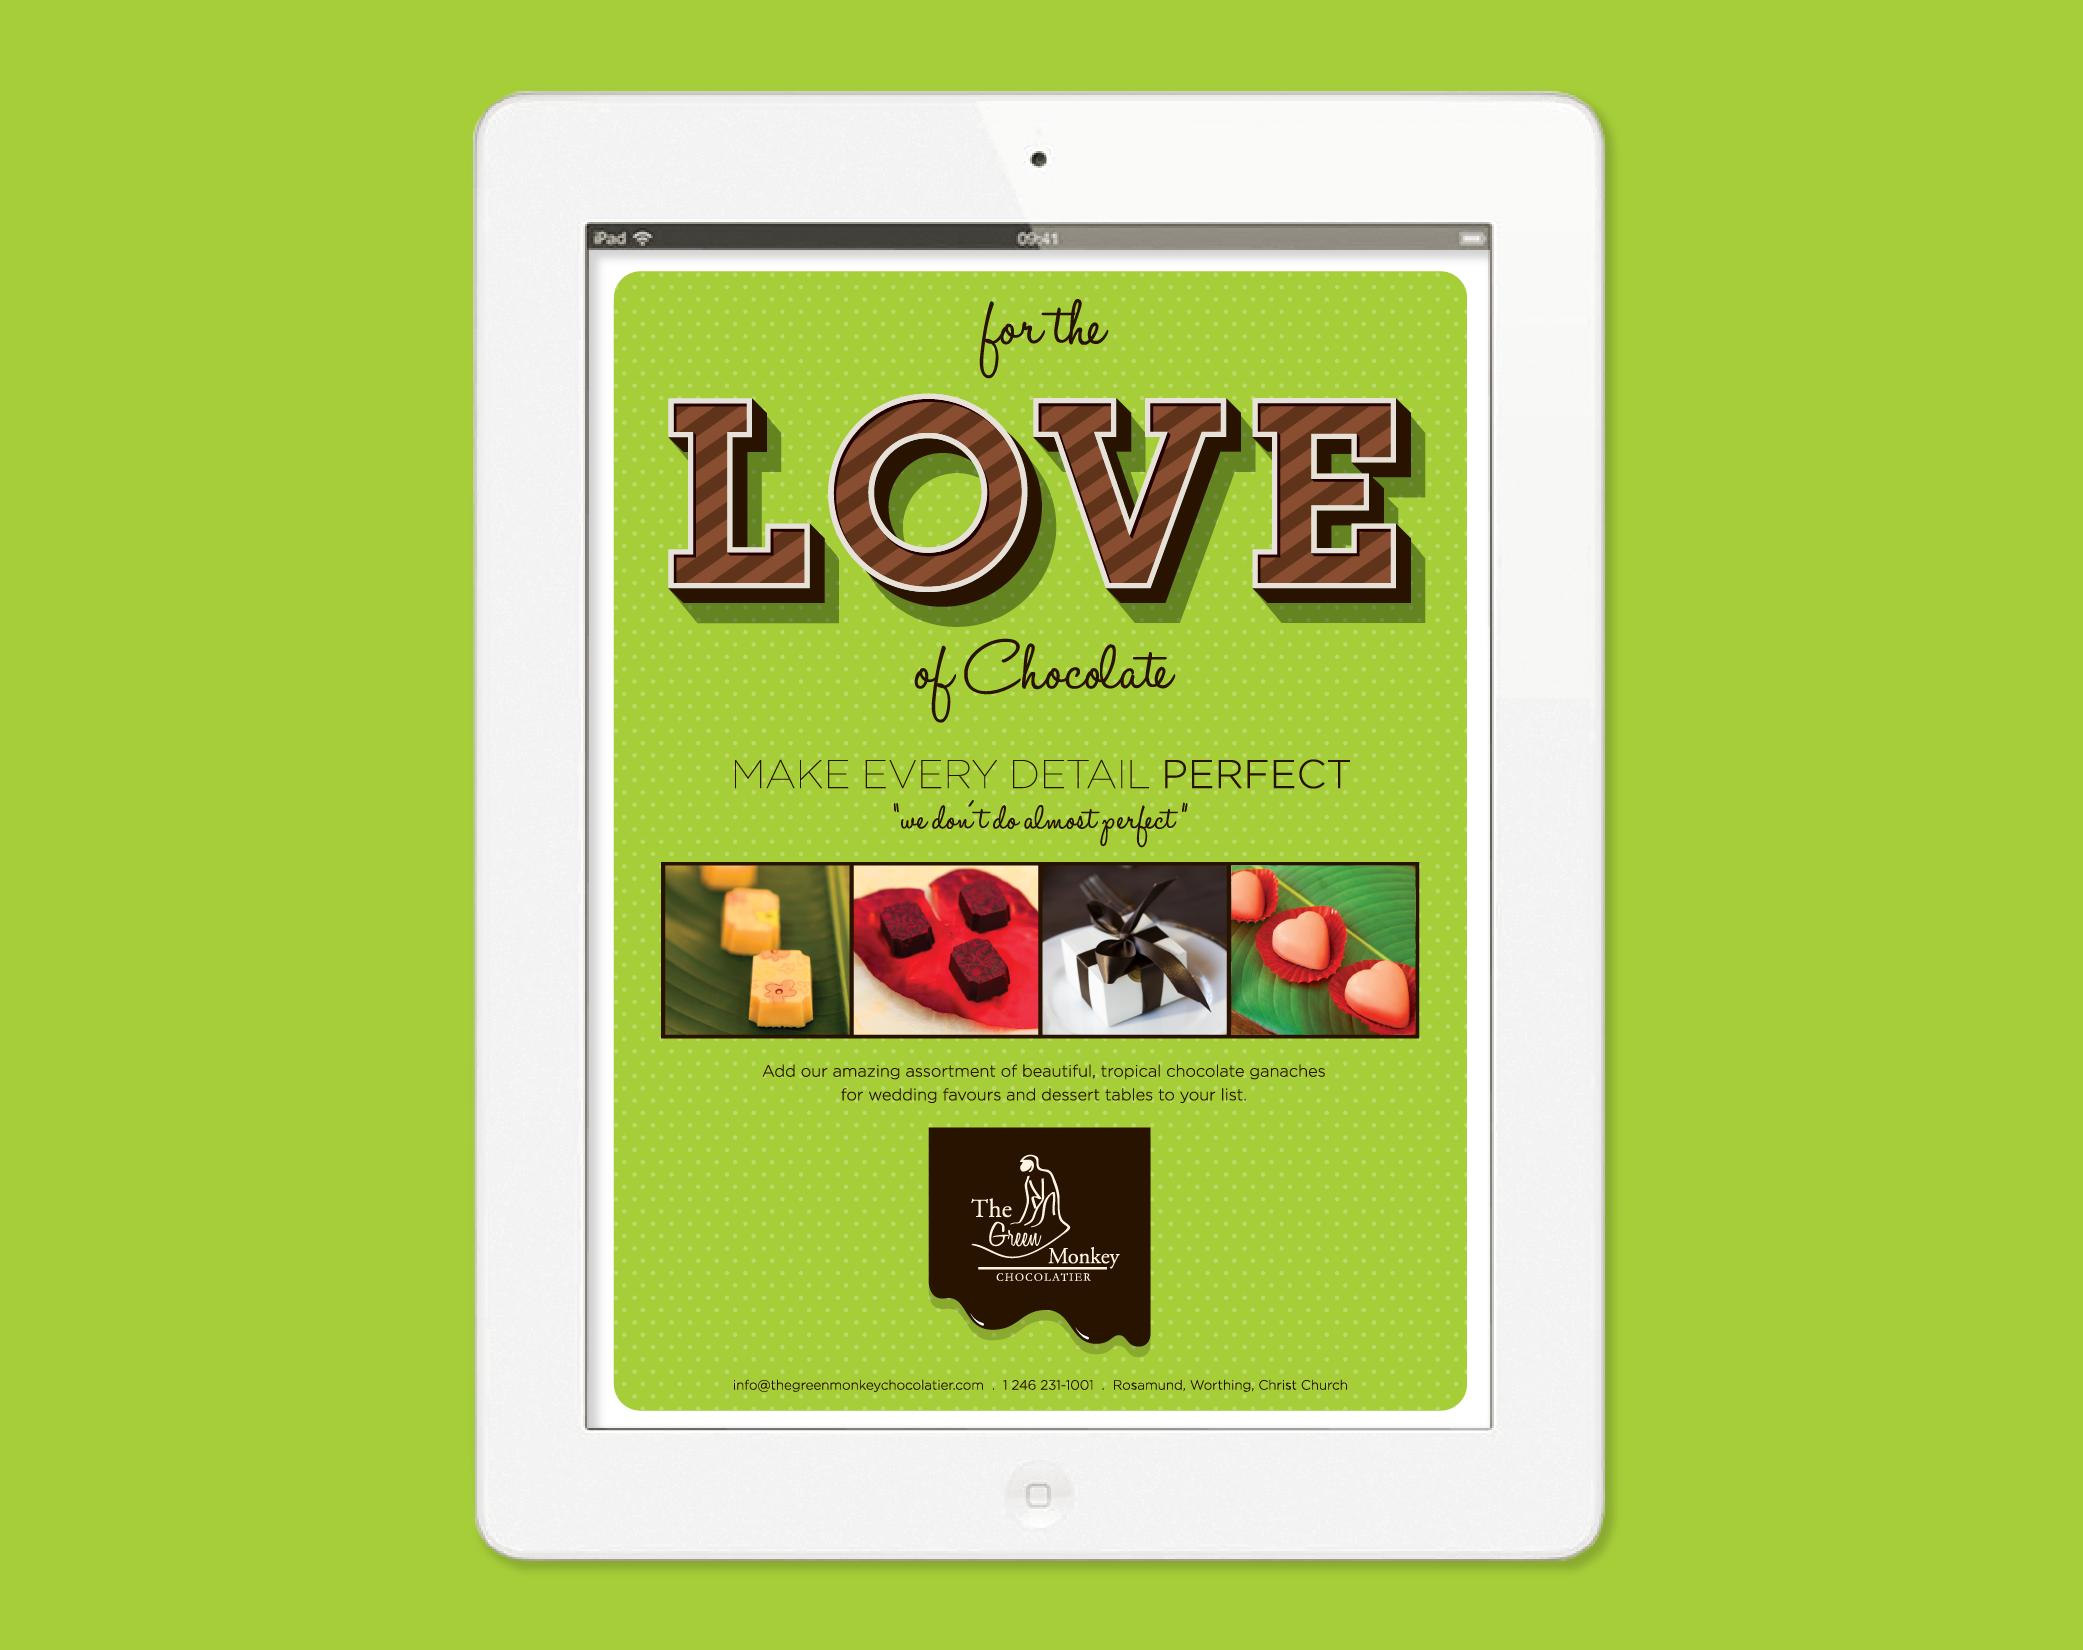 The Green Monkey Chocolatier -BrideLife Online Magazine - Ad